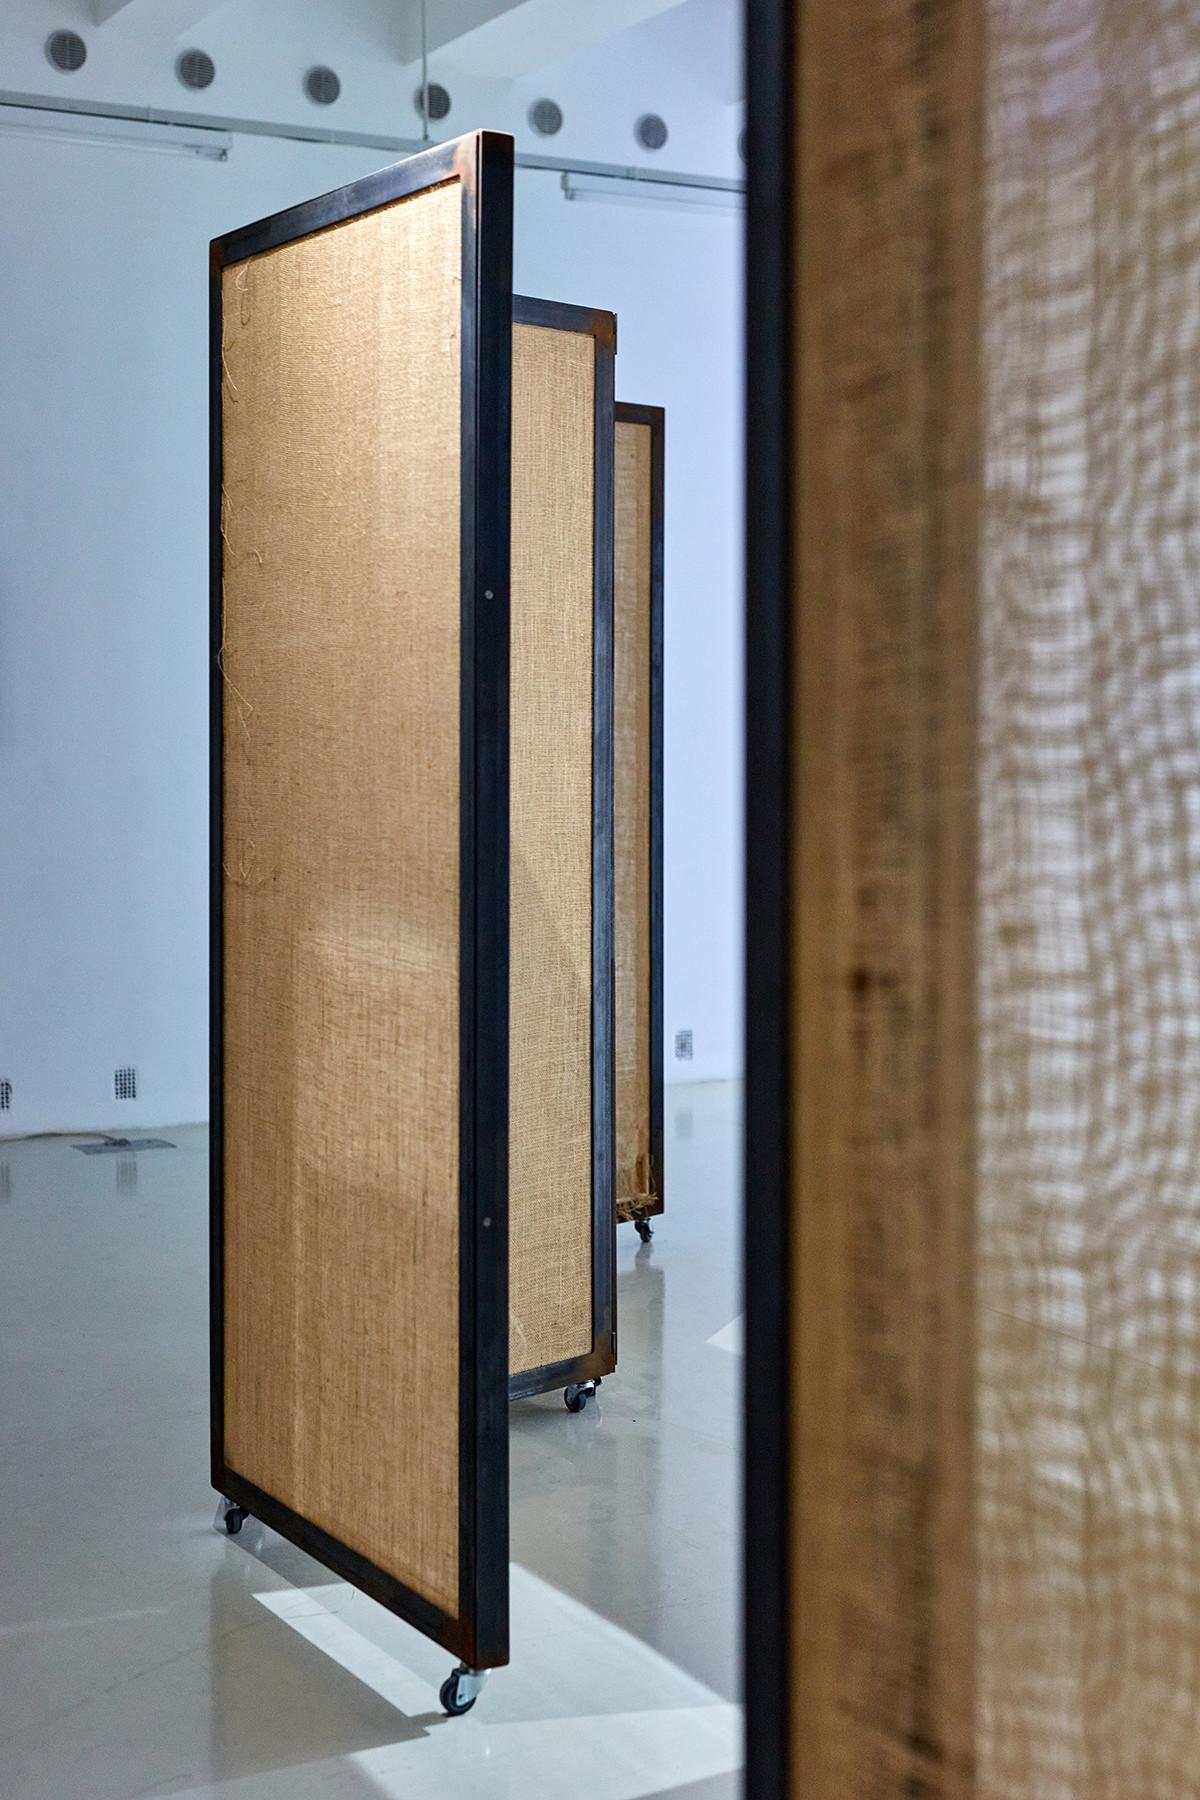 Roman Štětina: Untitled (Speak so I can see you), 2020. installation (jute, iron, wood) | photo: Dávid Biró